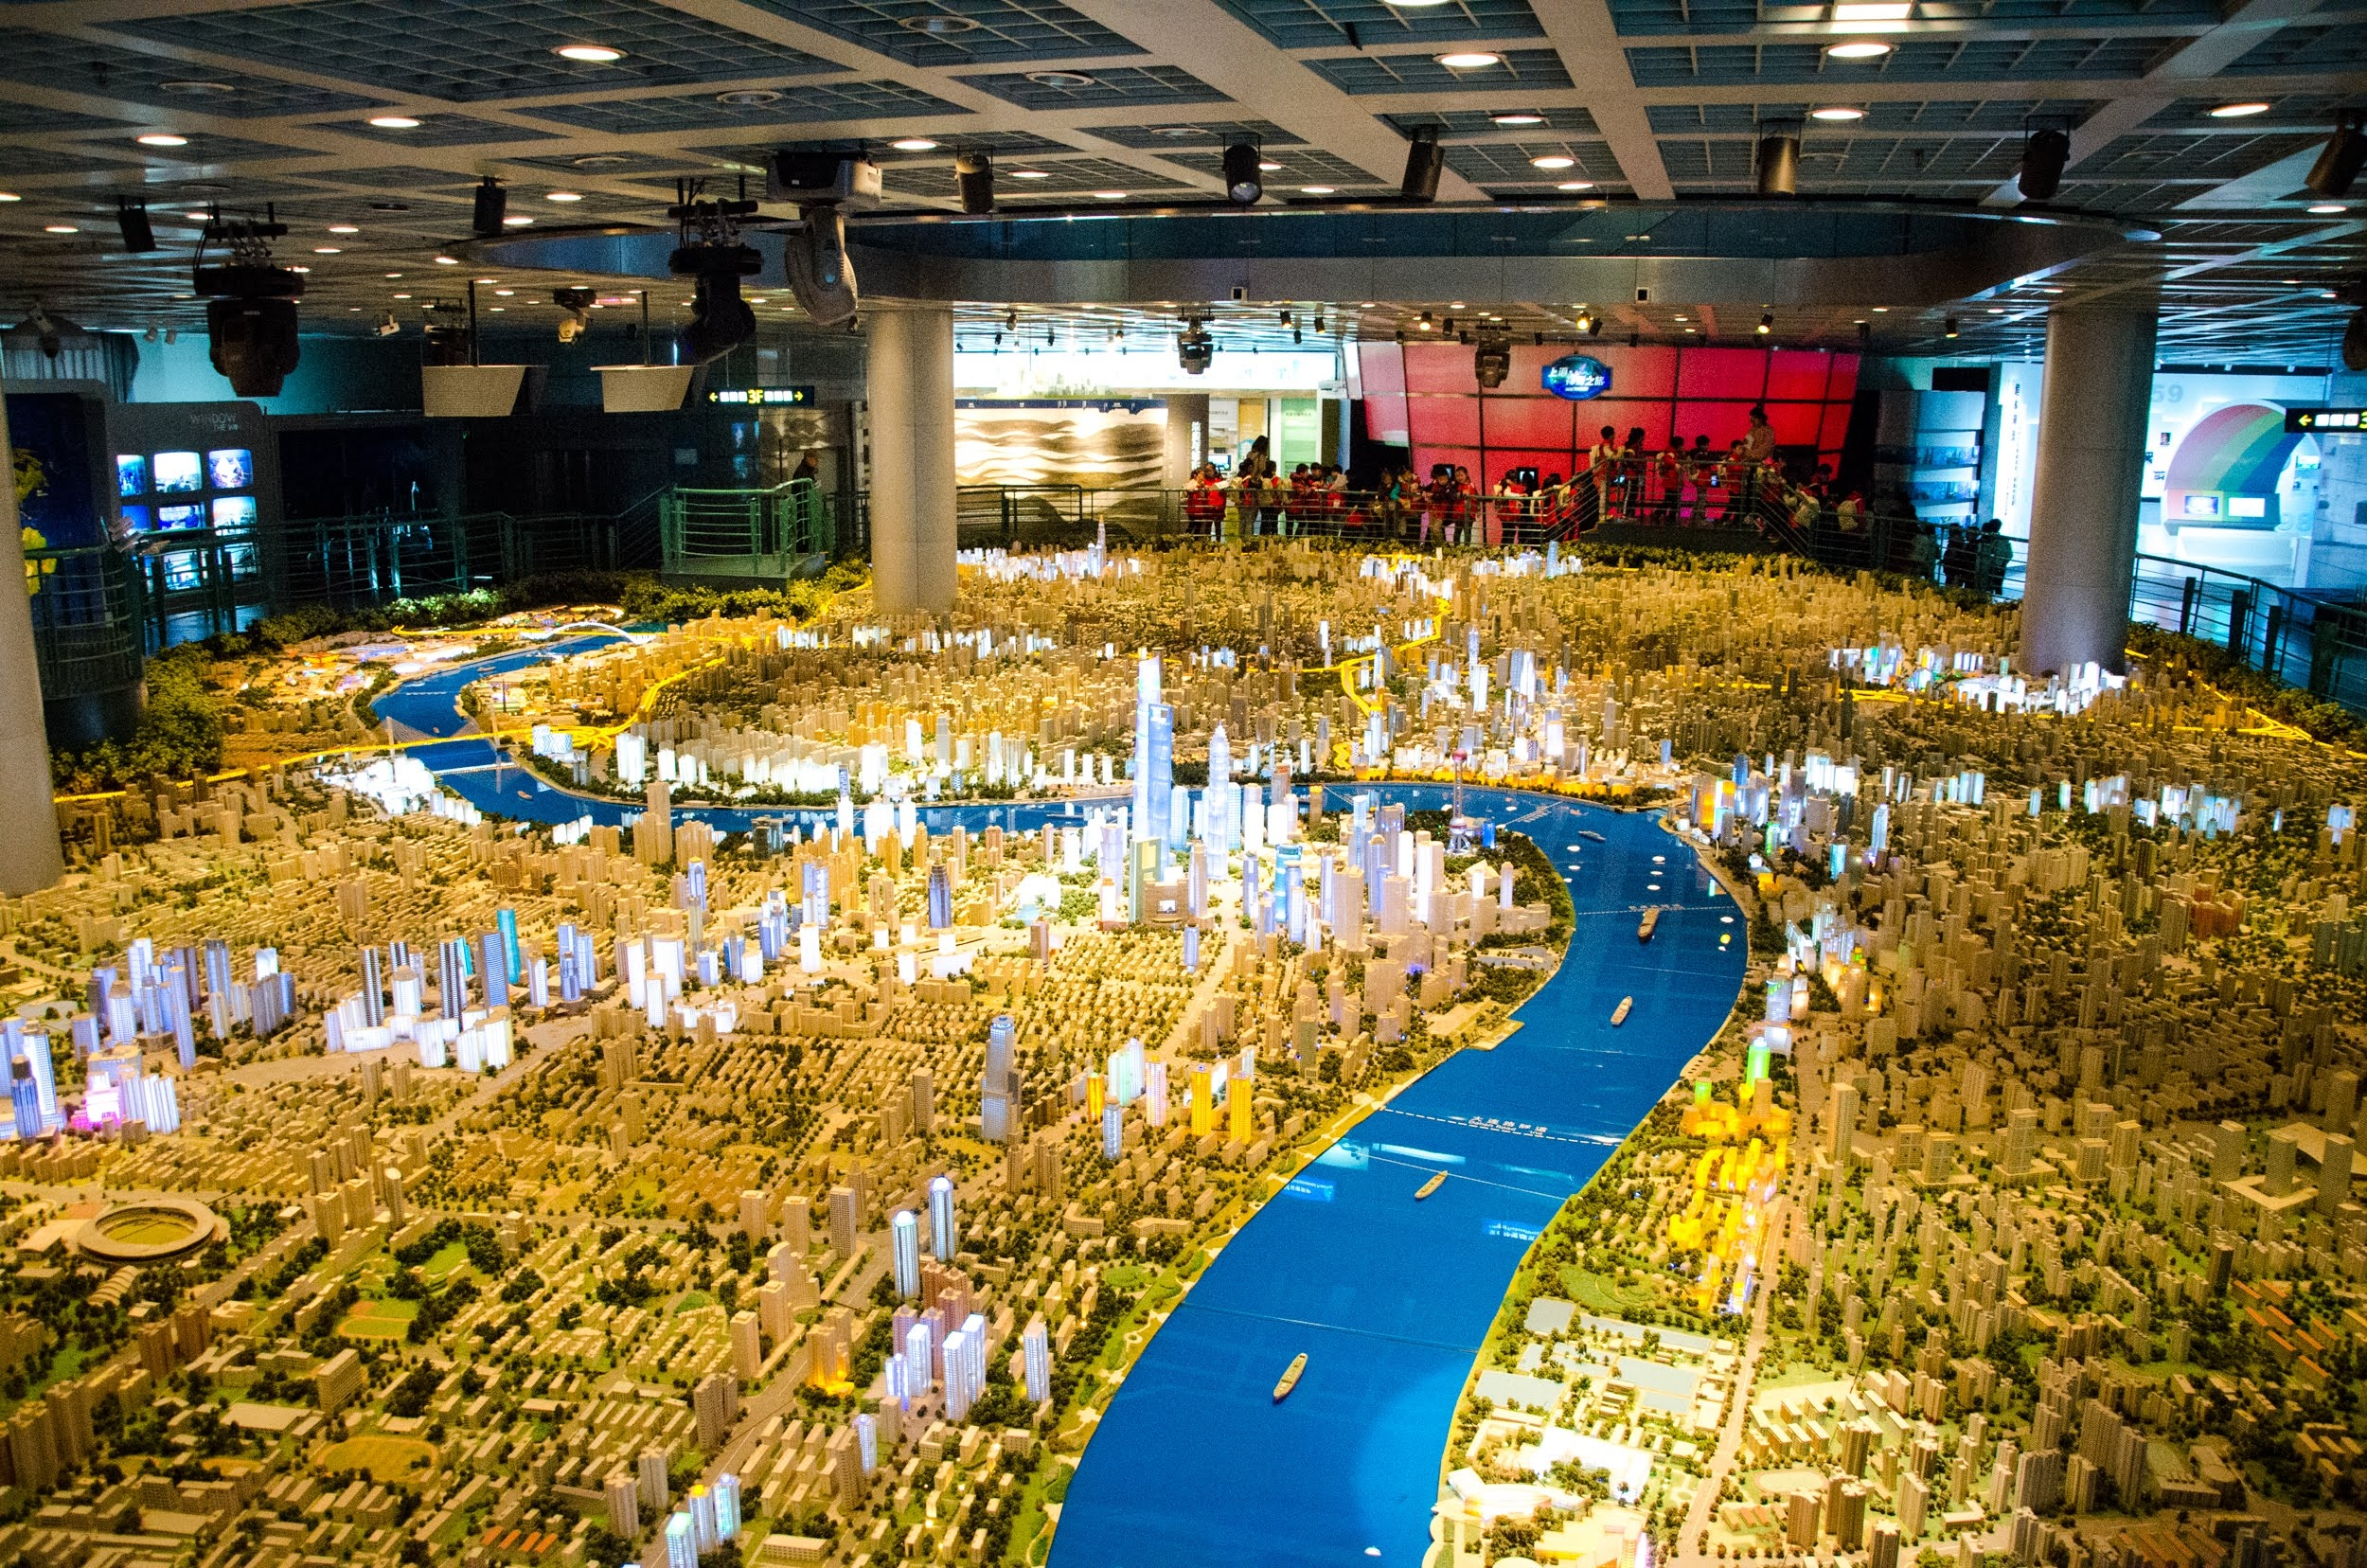 čínský městský obvod Minhang, Šangh zdroj foto: archiv mus - B. Vondruška